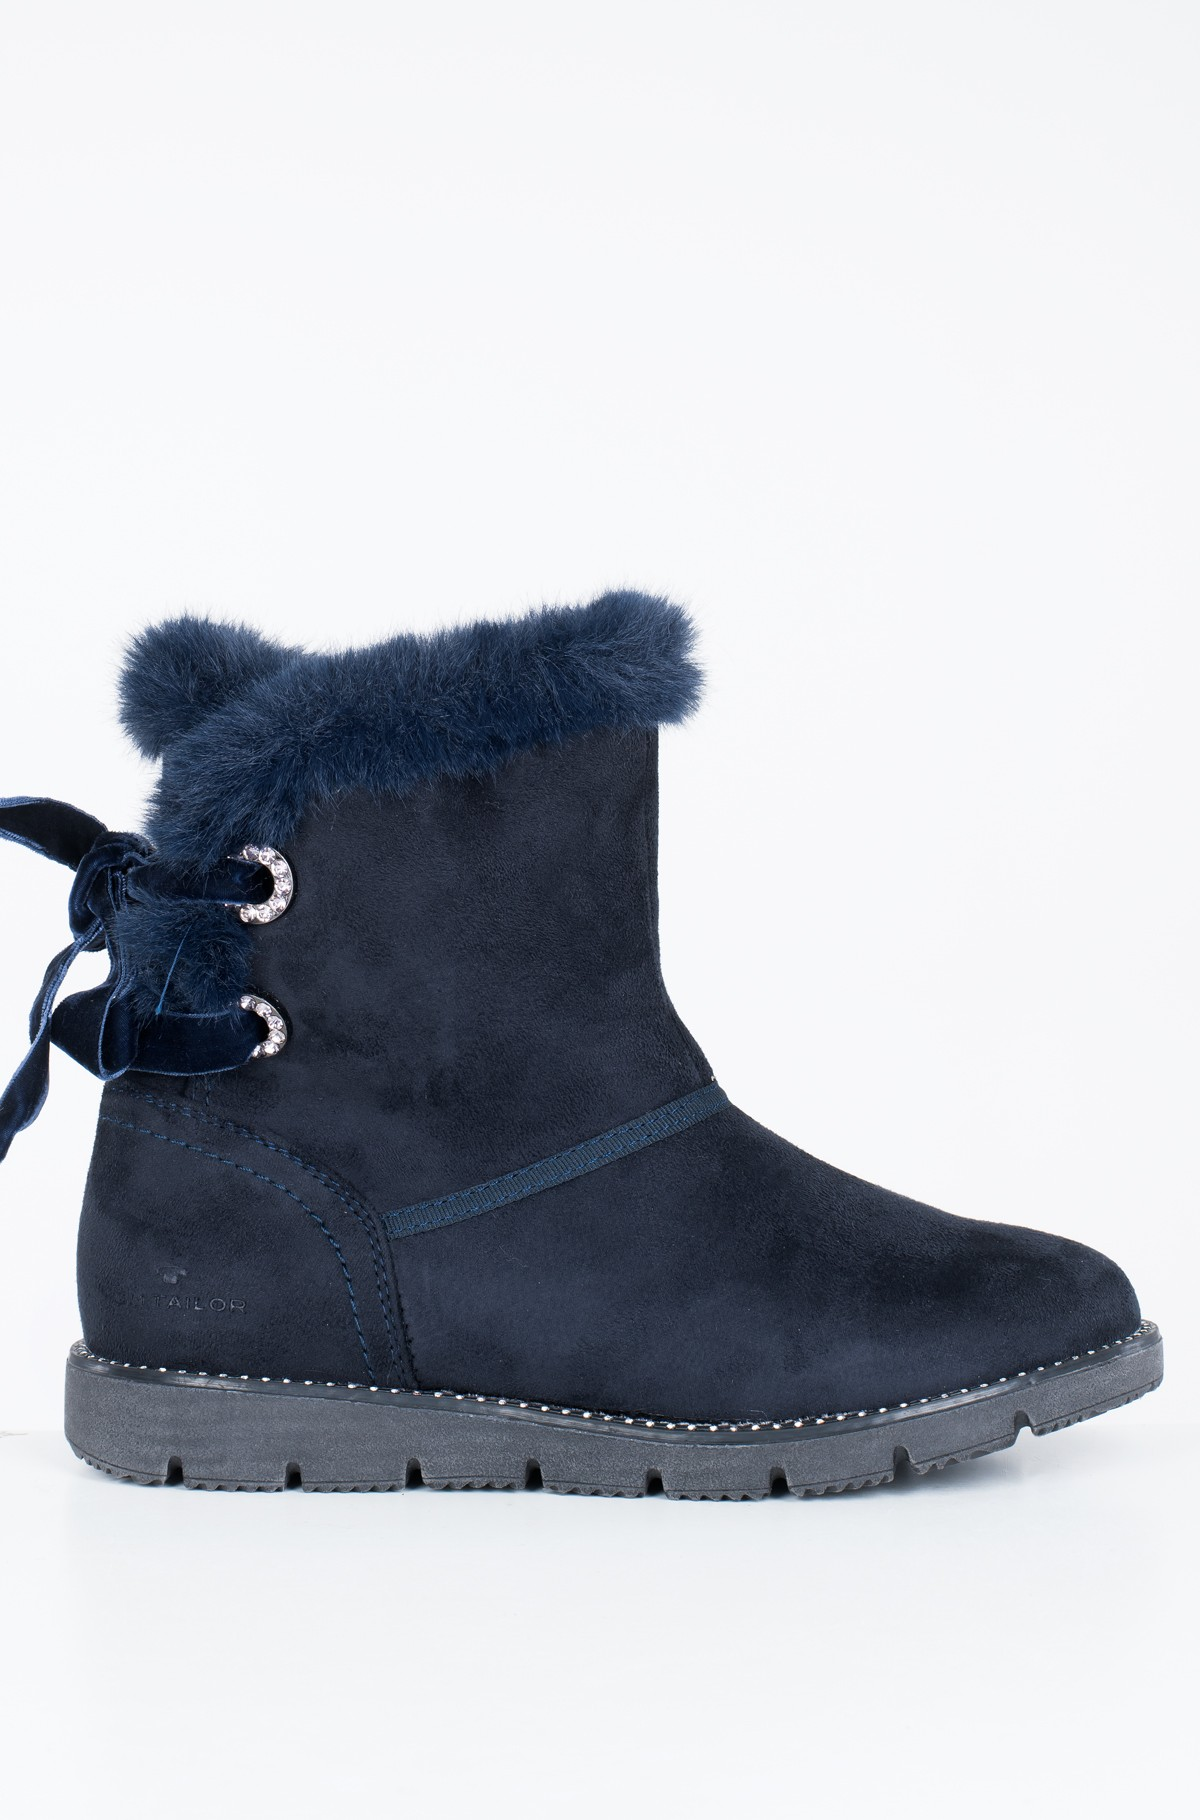 Boots 7993110-full-1